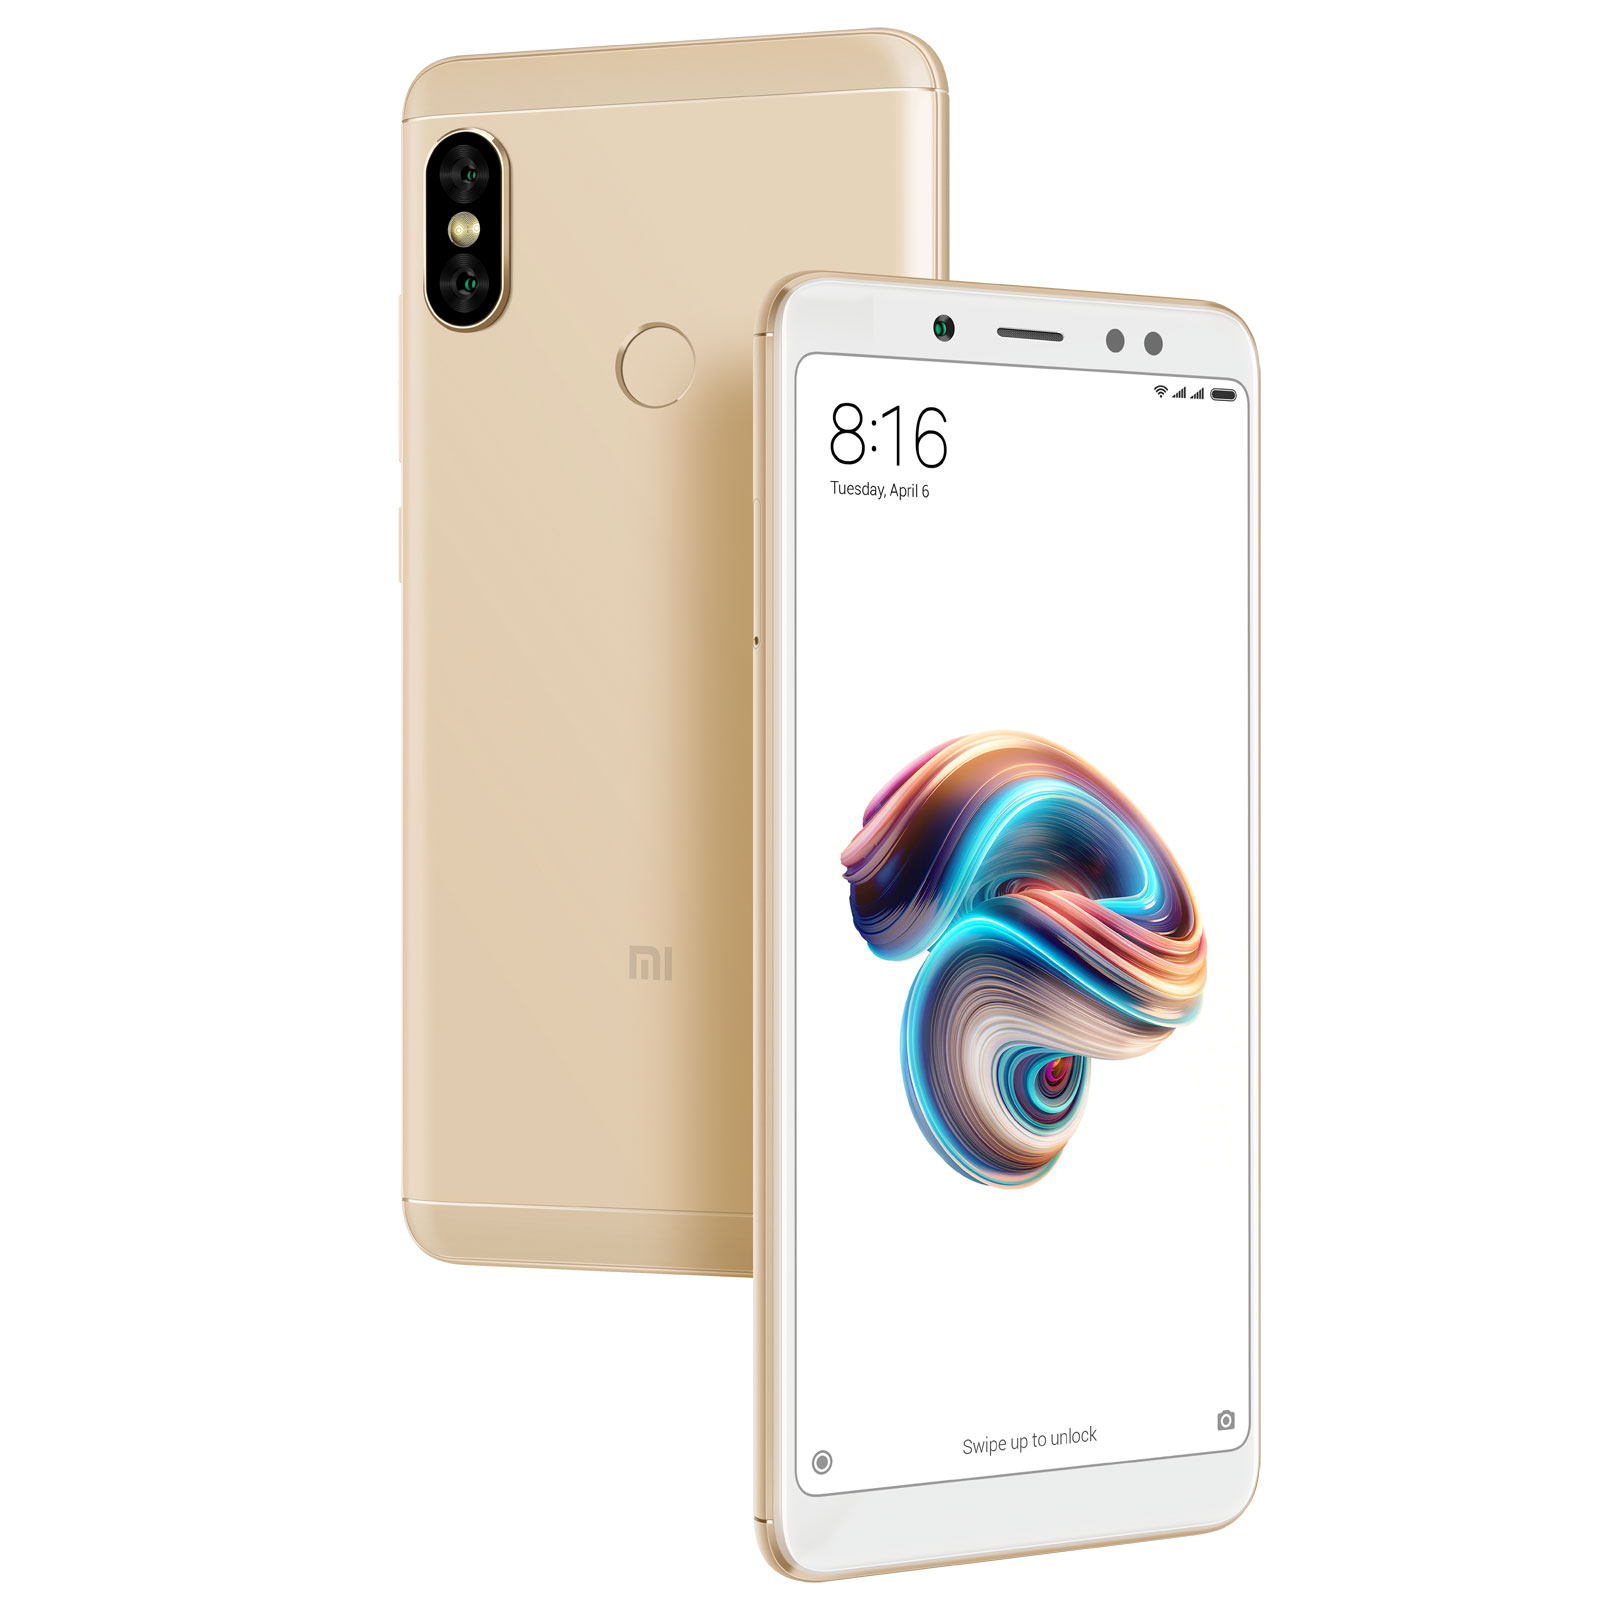 "Mobile & smartphone Xiaomi Redmi Note 5 Or (4 Go / 64 Go) Smartphone 4G-LTE Dual SIM - Snapdragon 636 Octo-Core 1.8 GHz - RAM 4 Go - Ecran tactile 5.99"" 1080 x 2160 - 64 Go - NFC/Bluetooth 5.0 - 4000 mAh - Android 8.1"